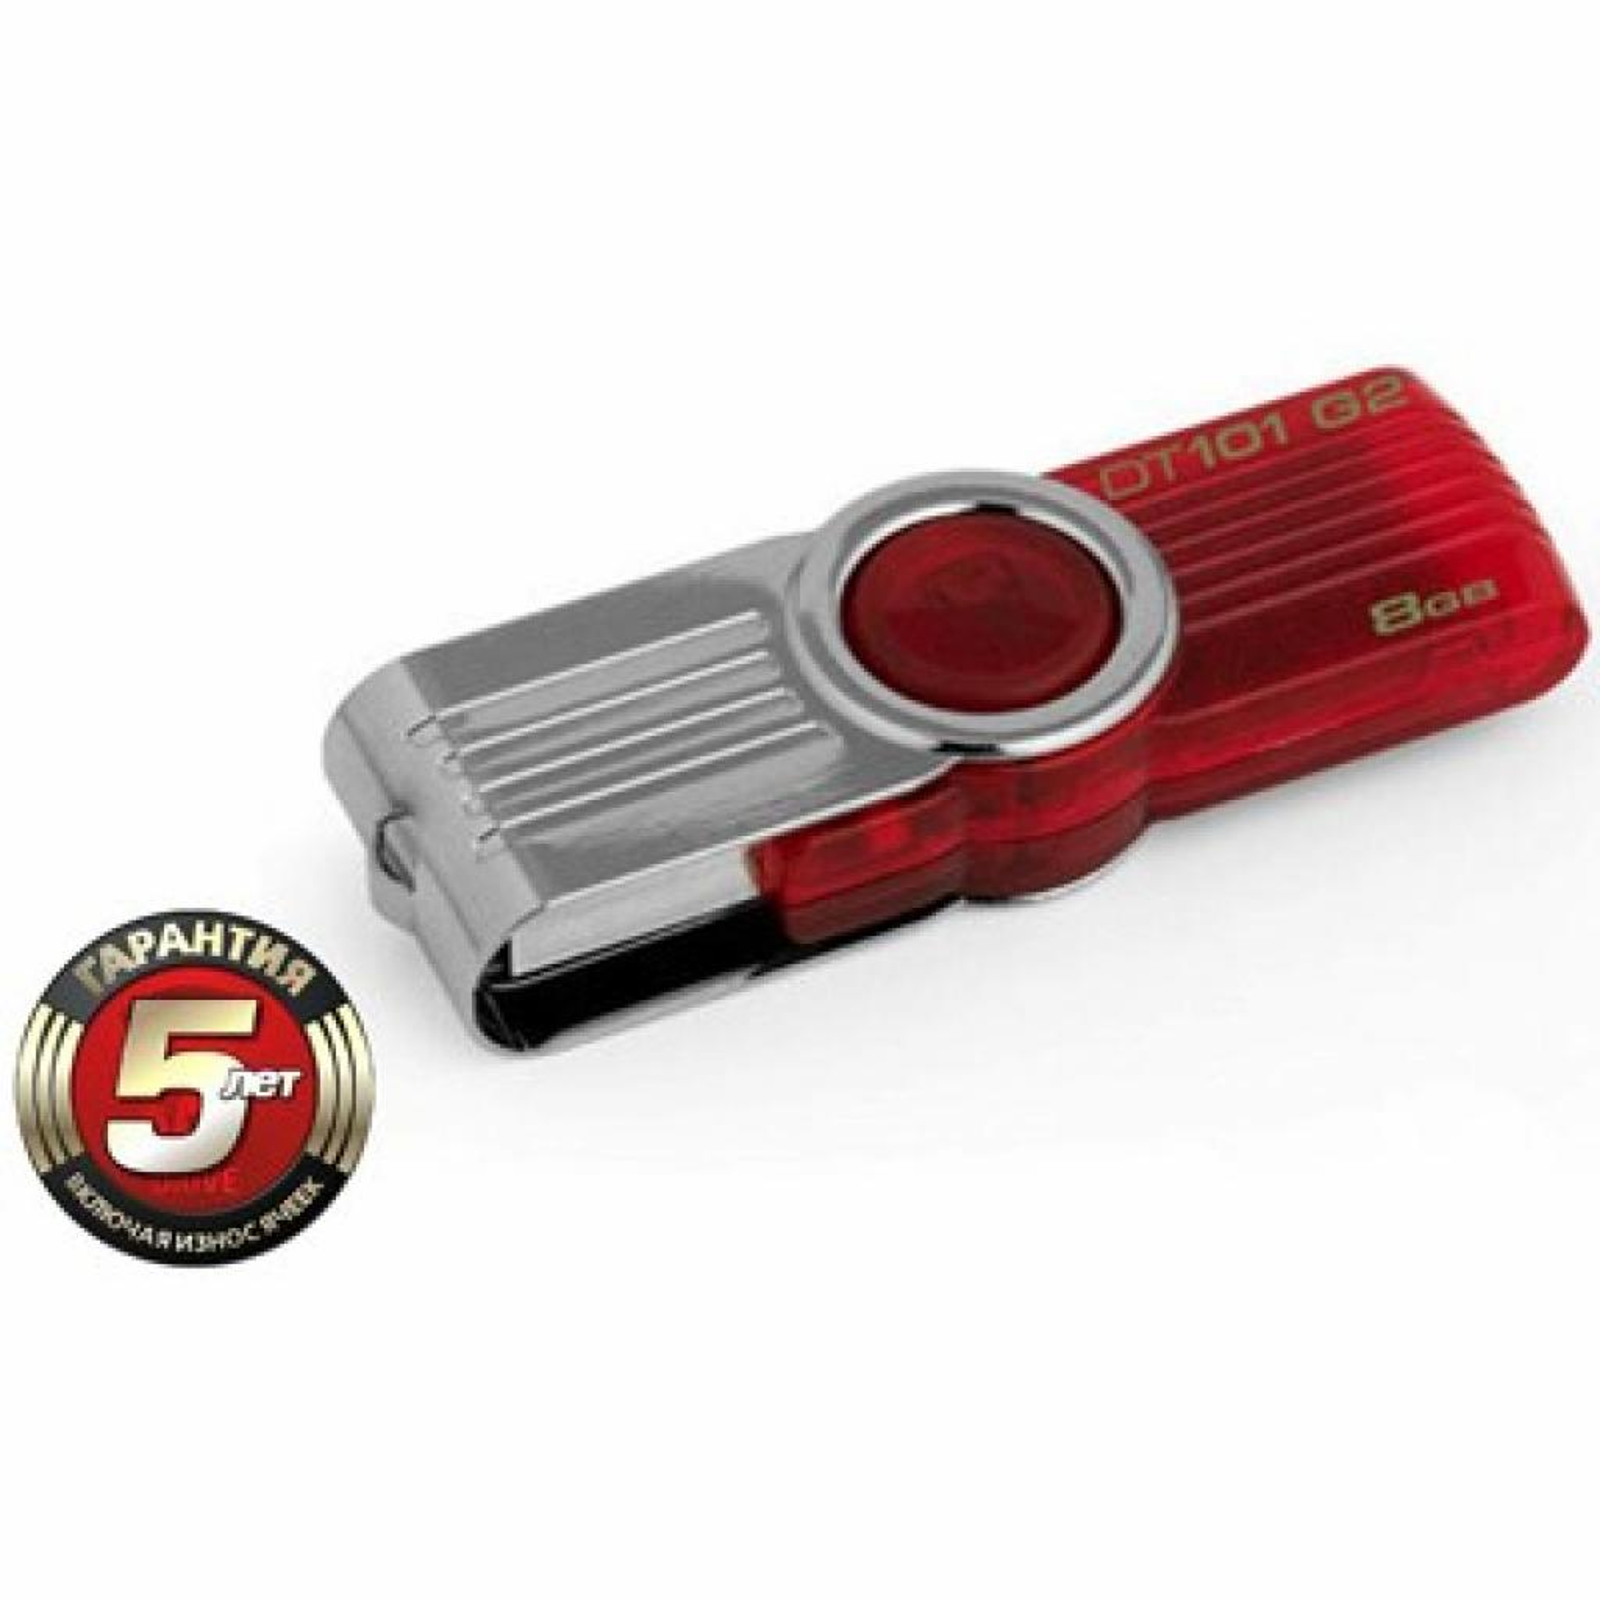 USB флеш накопитель 8Gb DataTraveler 101 G2 Kingston (DT101G2/8GB/DT101G2/8GBZ)